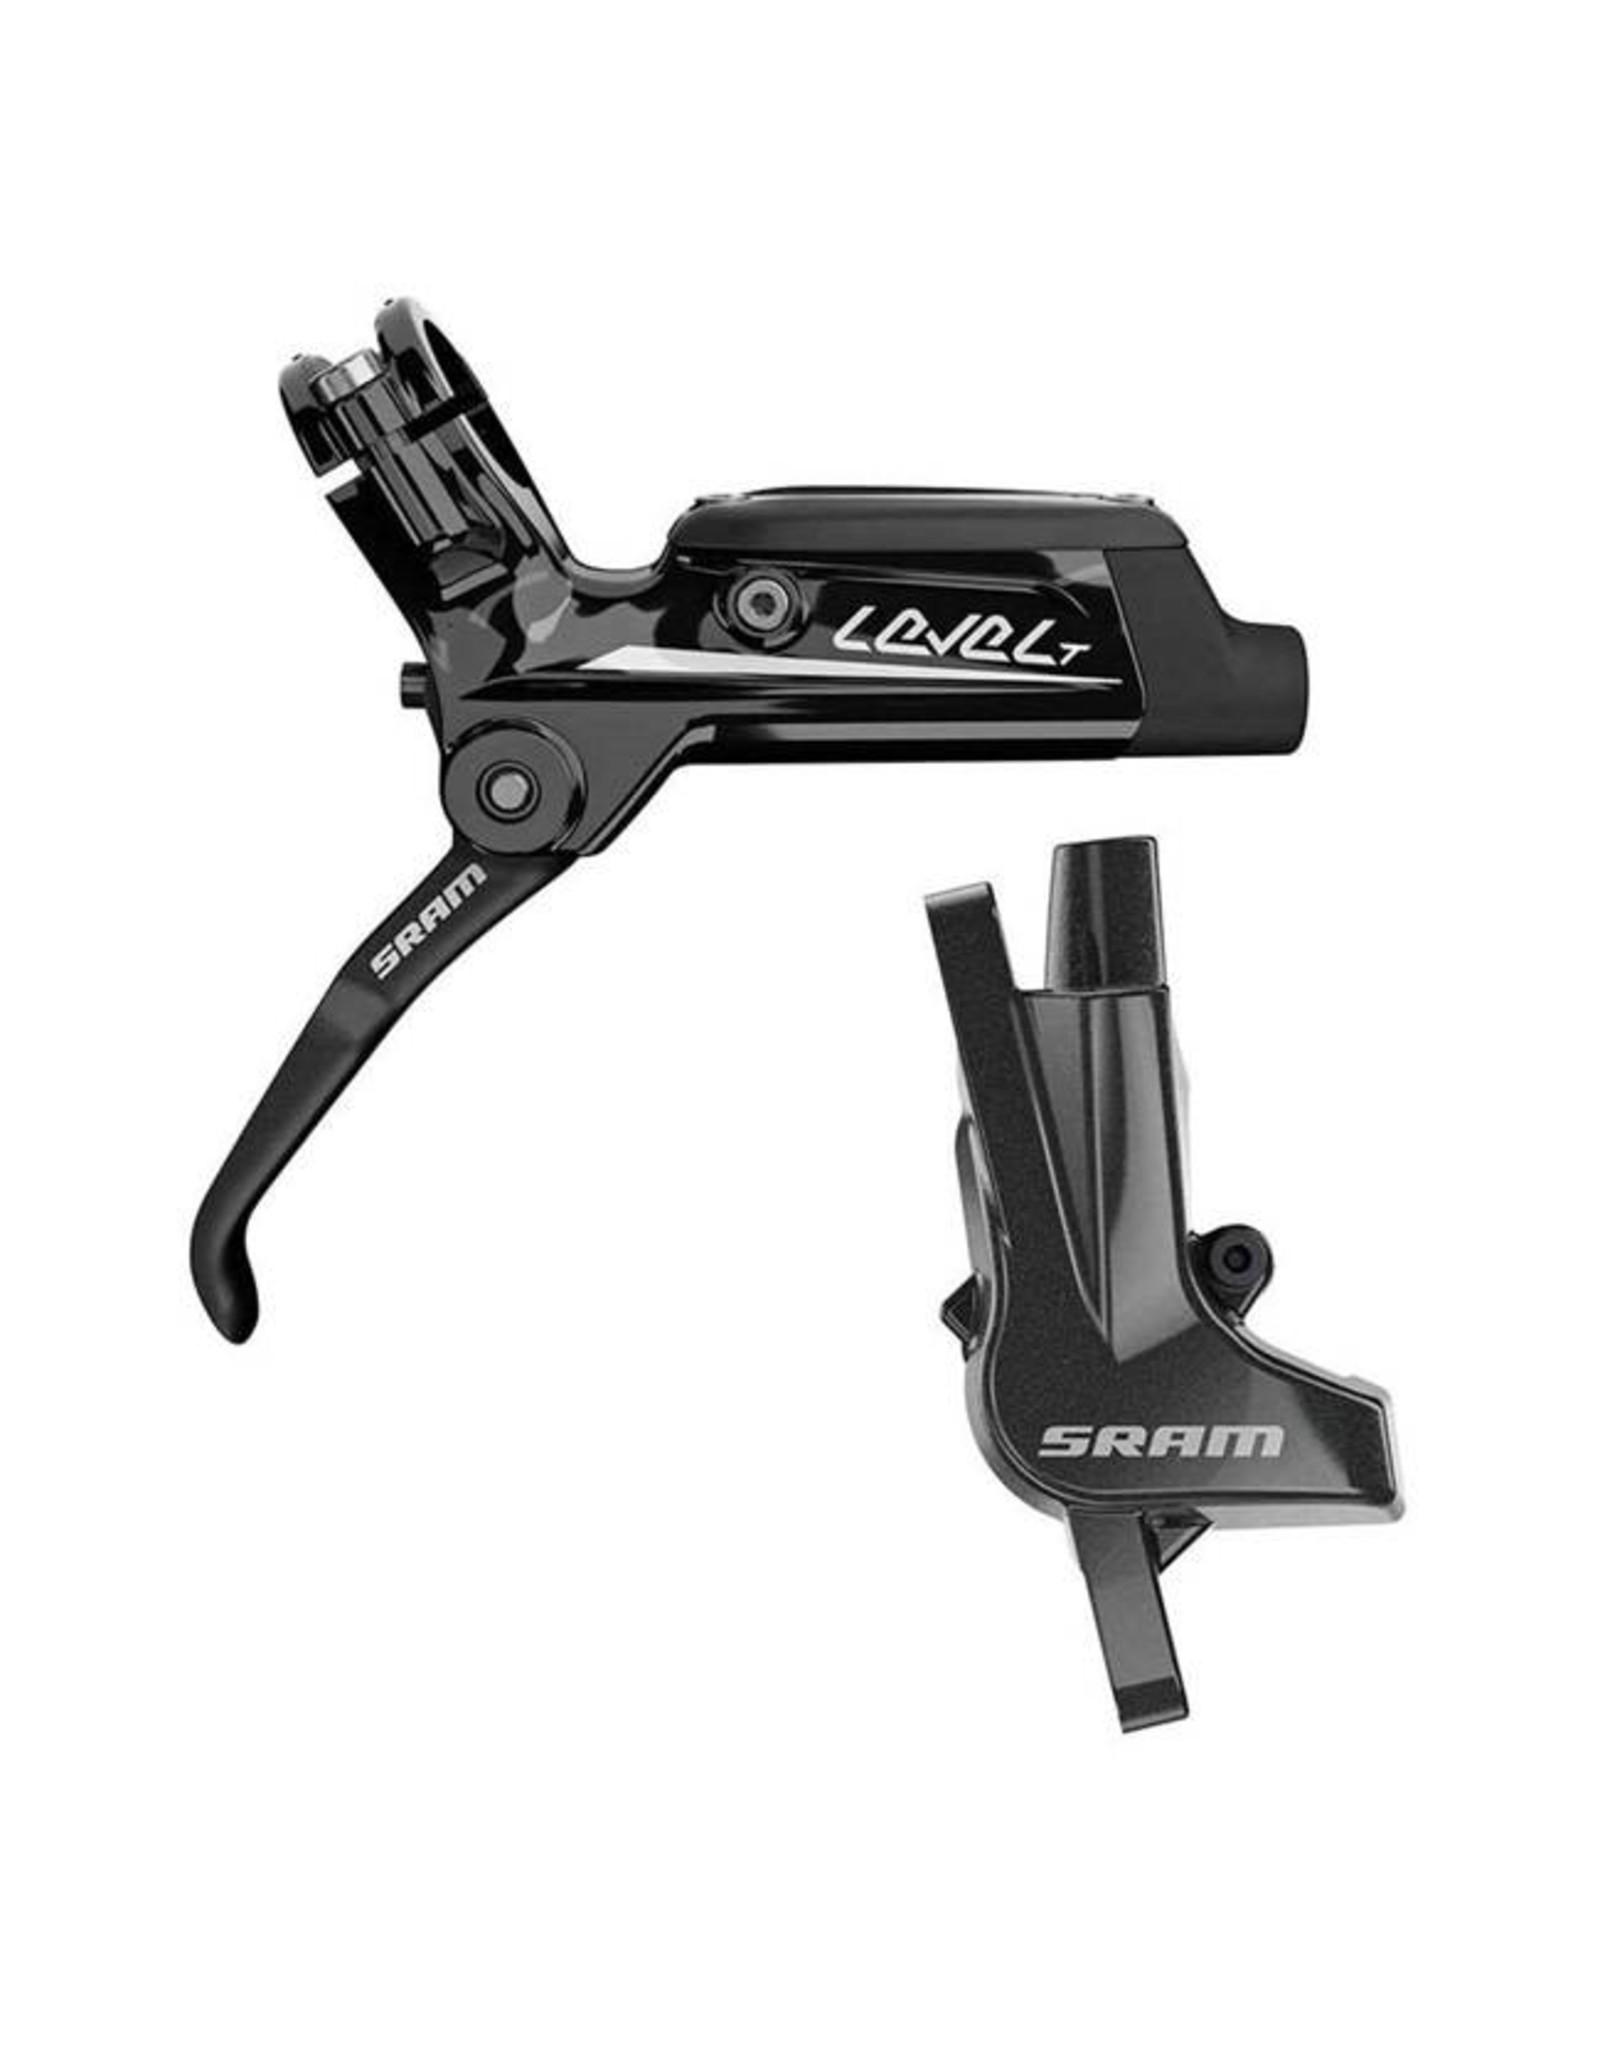 SRAM SRAM Level T Disc Brake Rear 1800mm Hose Black, Rotor/Bracket Sold Separately A1